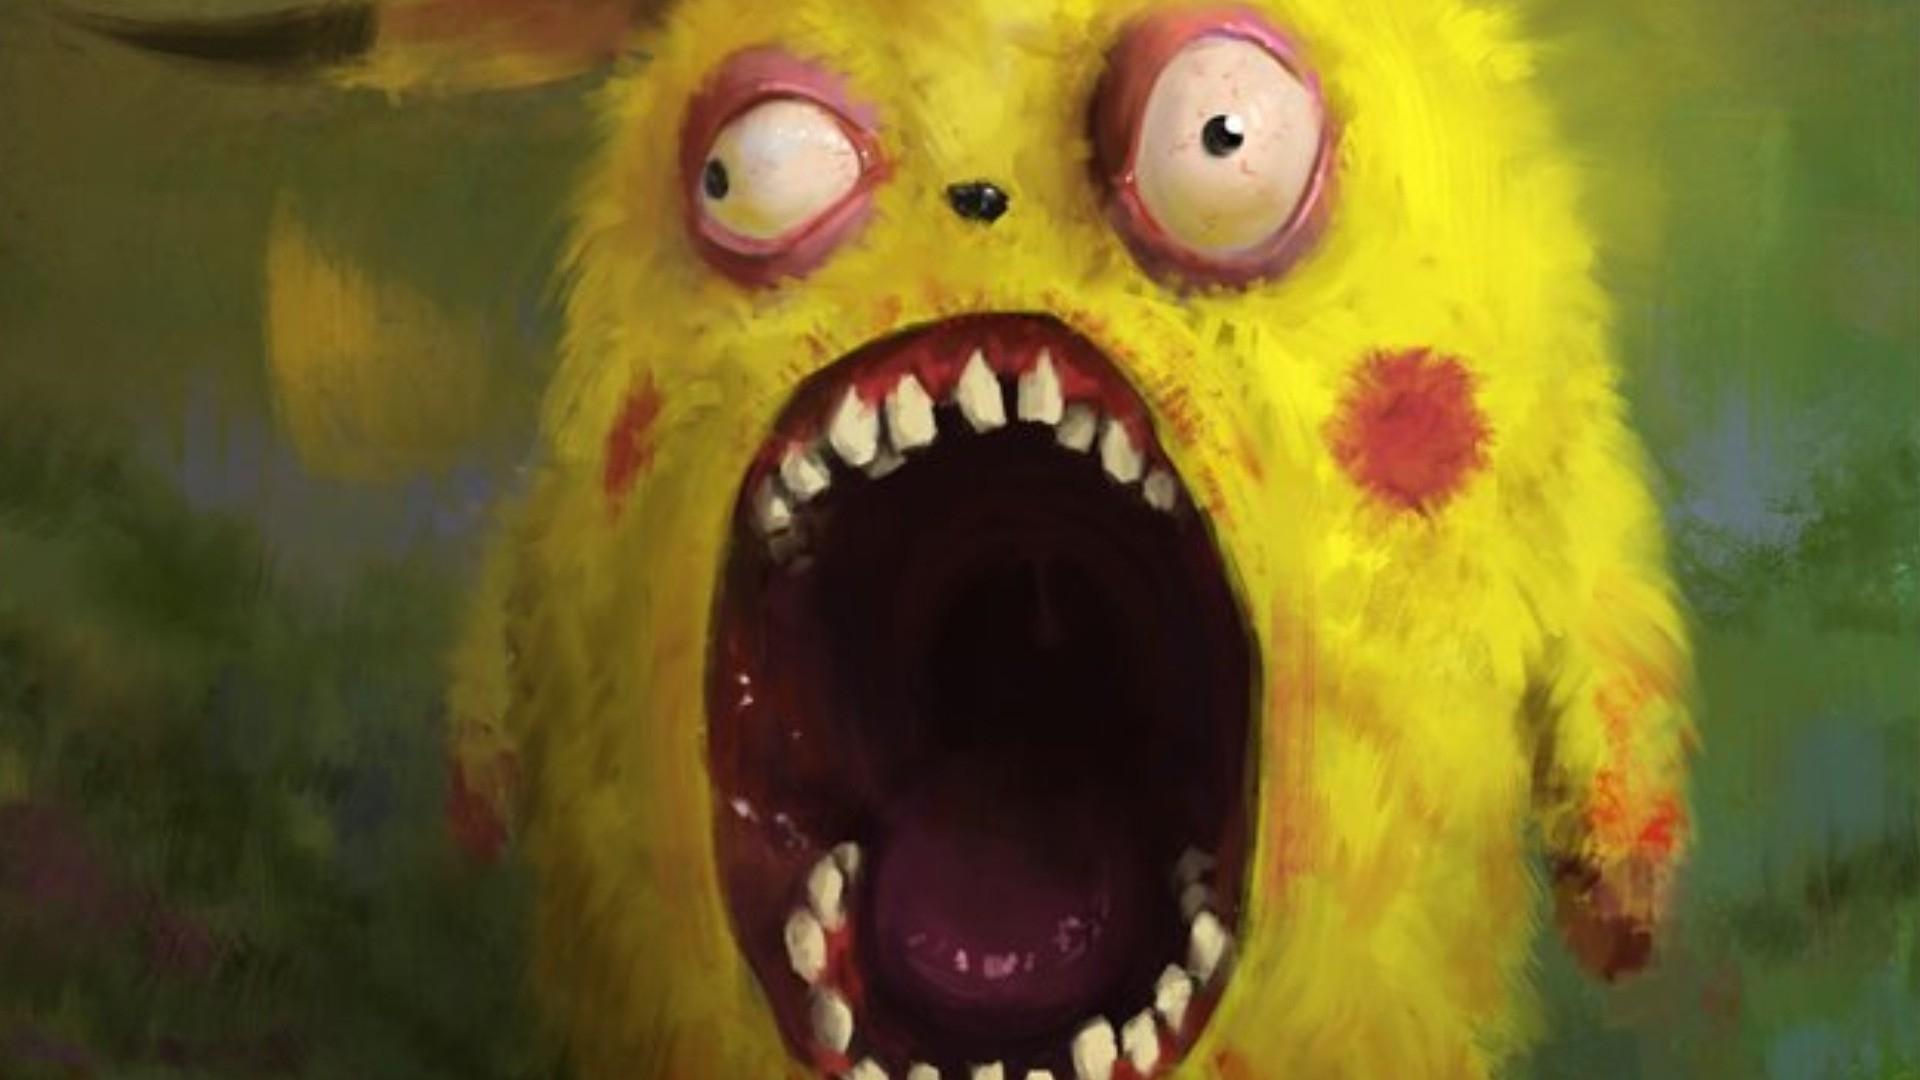 1920x1080 zombies pikachu fantasy art artwork 1920x1080 wallpaper Art 1920x1080